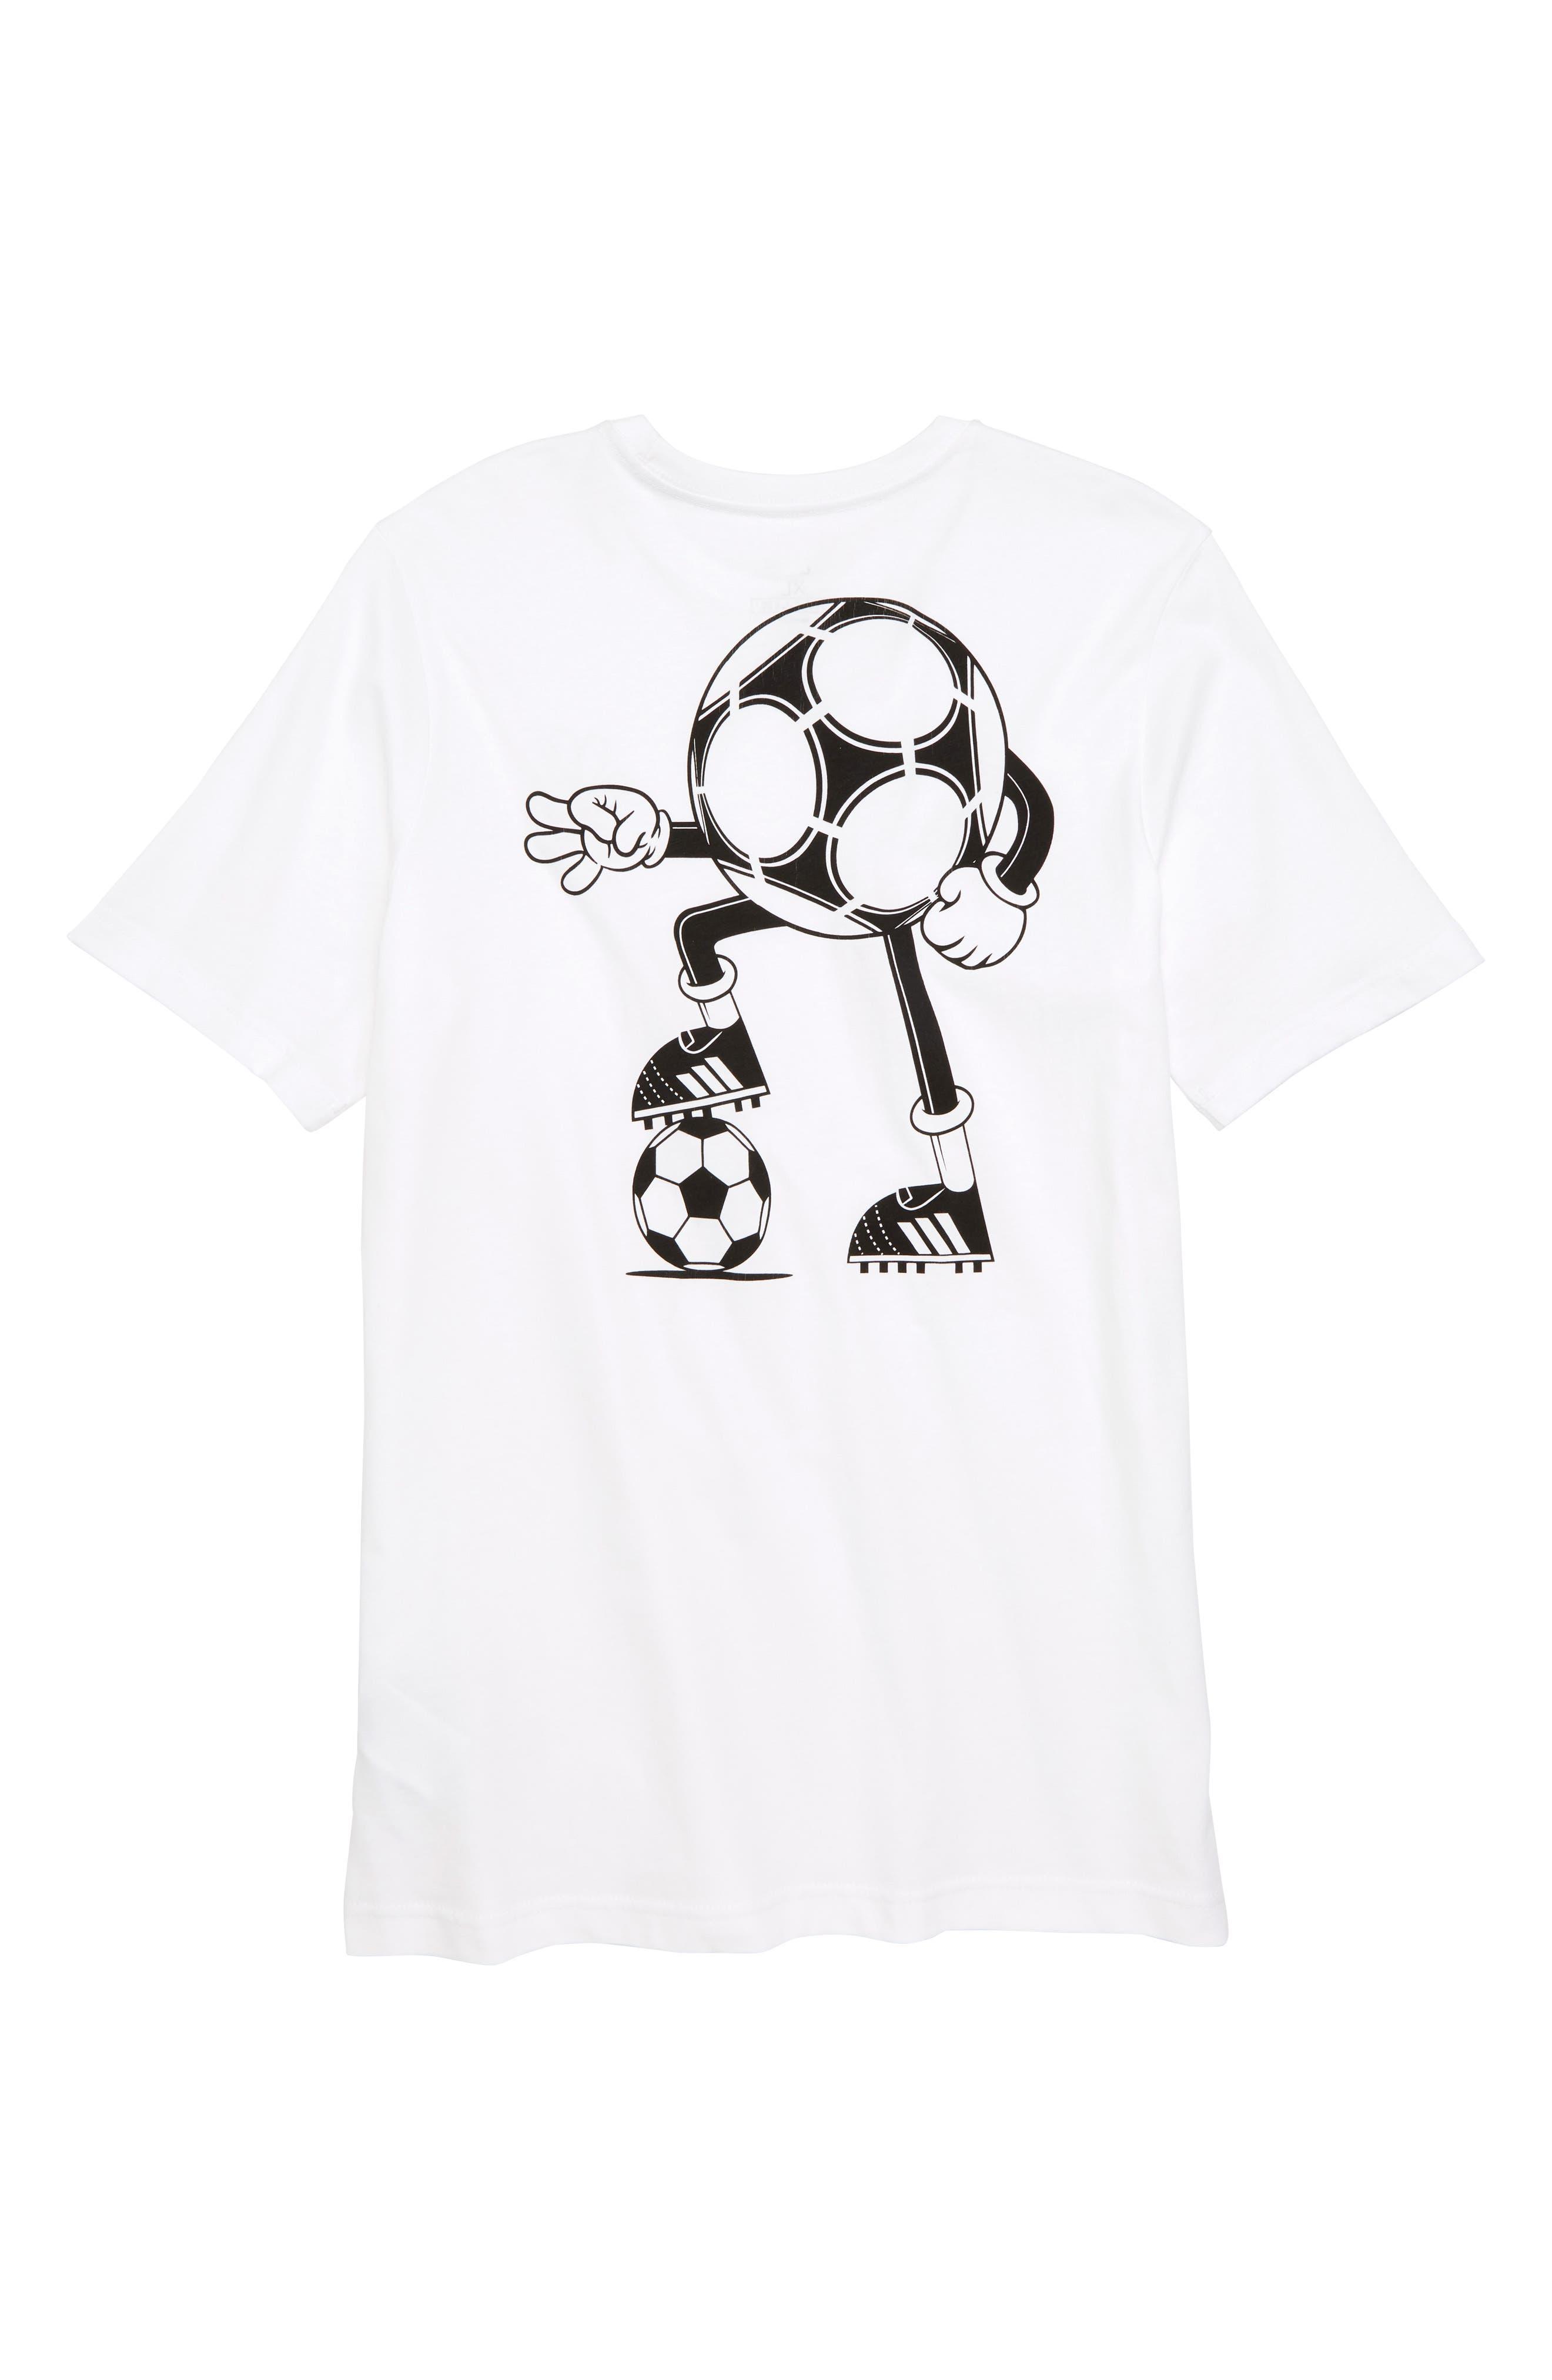 2018 FIFA World Cup Mascot T-Shirt,                             Alternate thumbnail 2, color,                             White